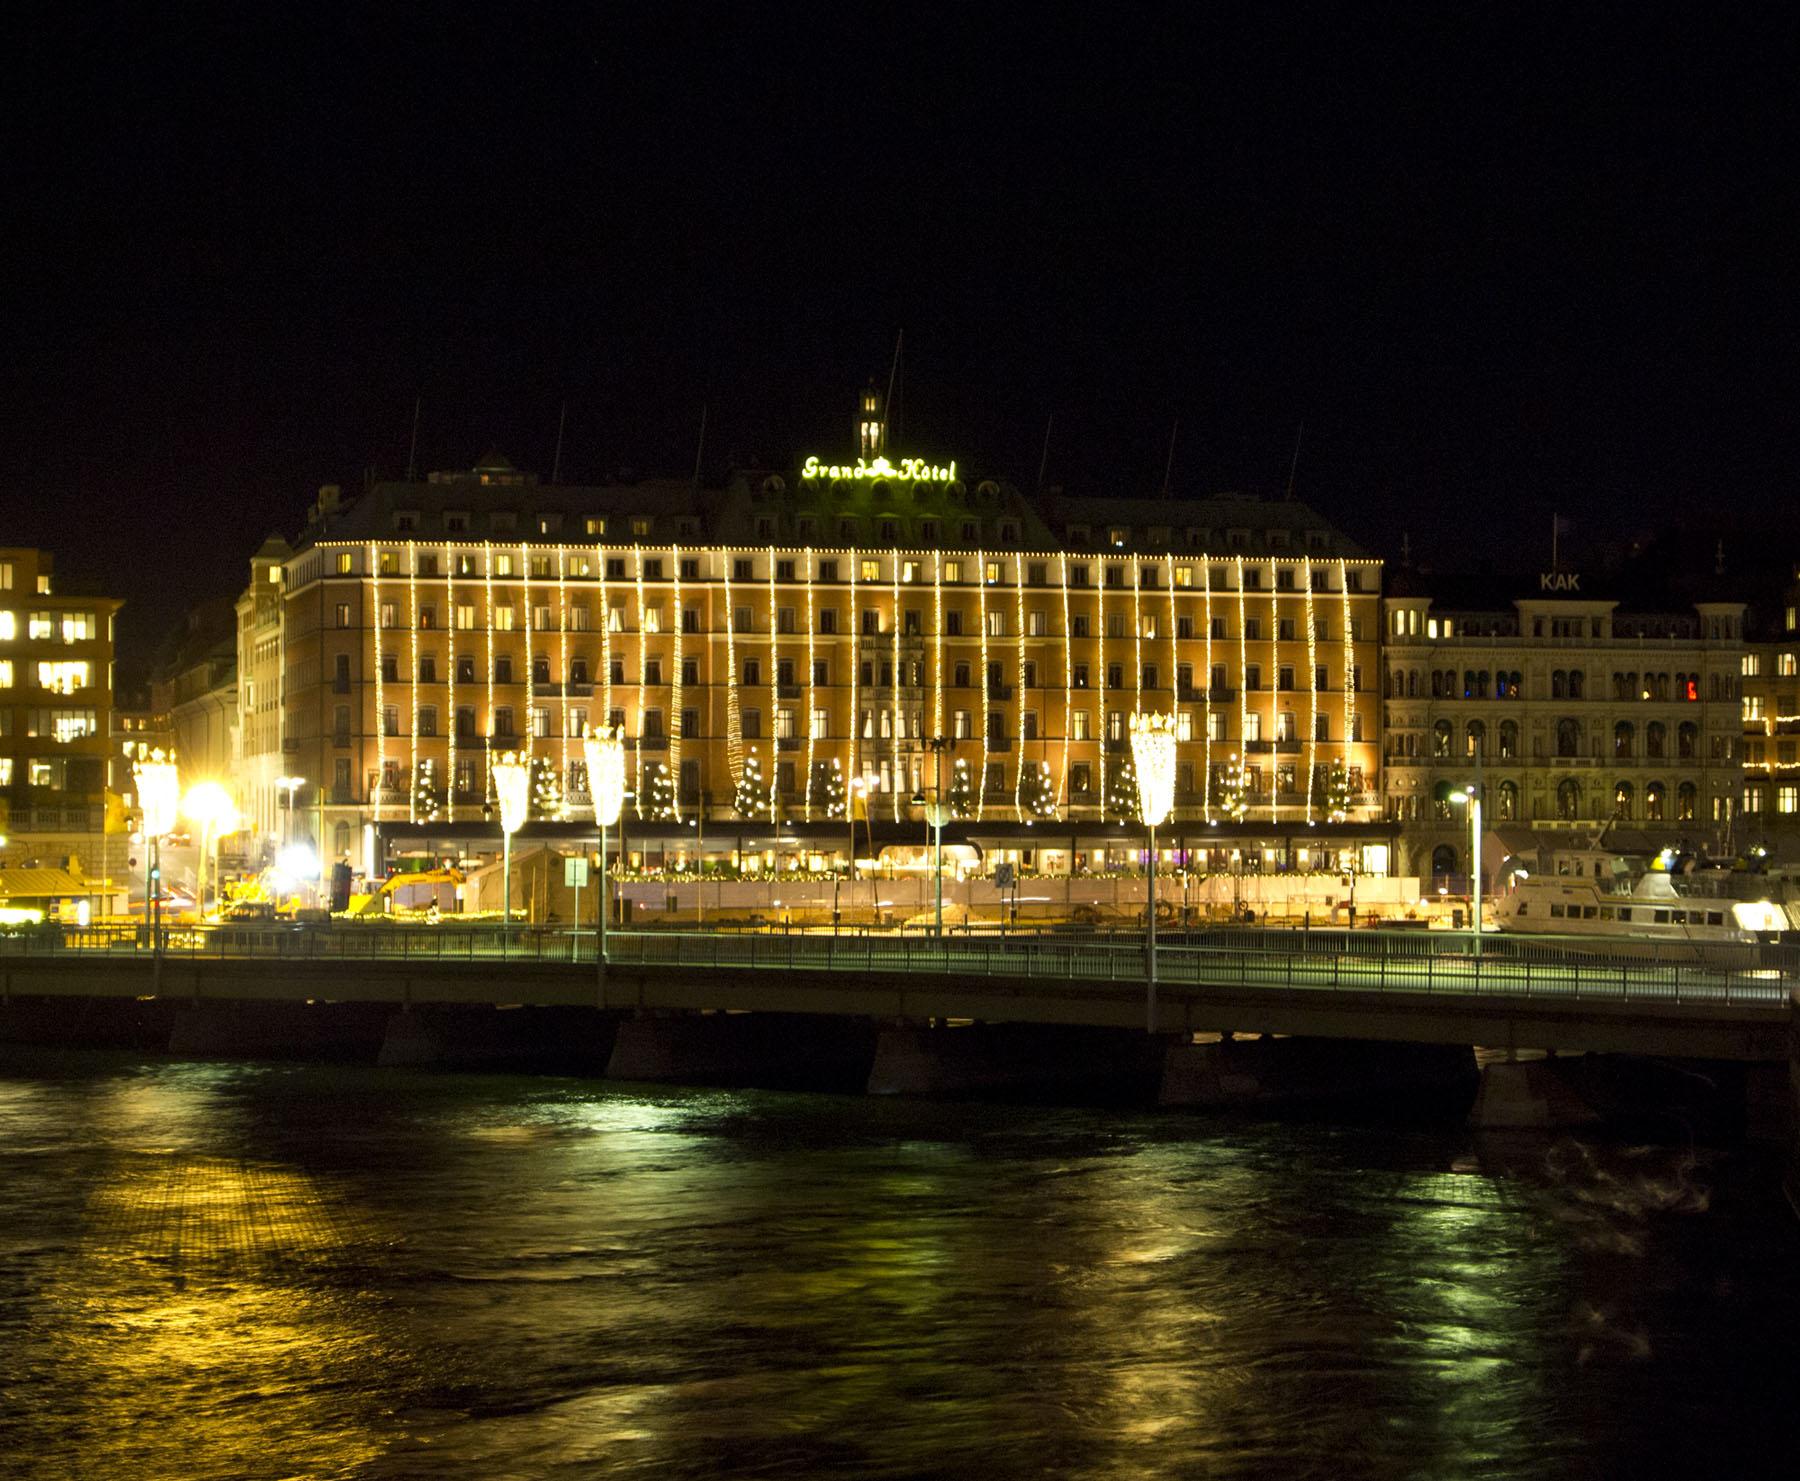 hotell stockholm erbjudande ica